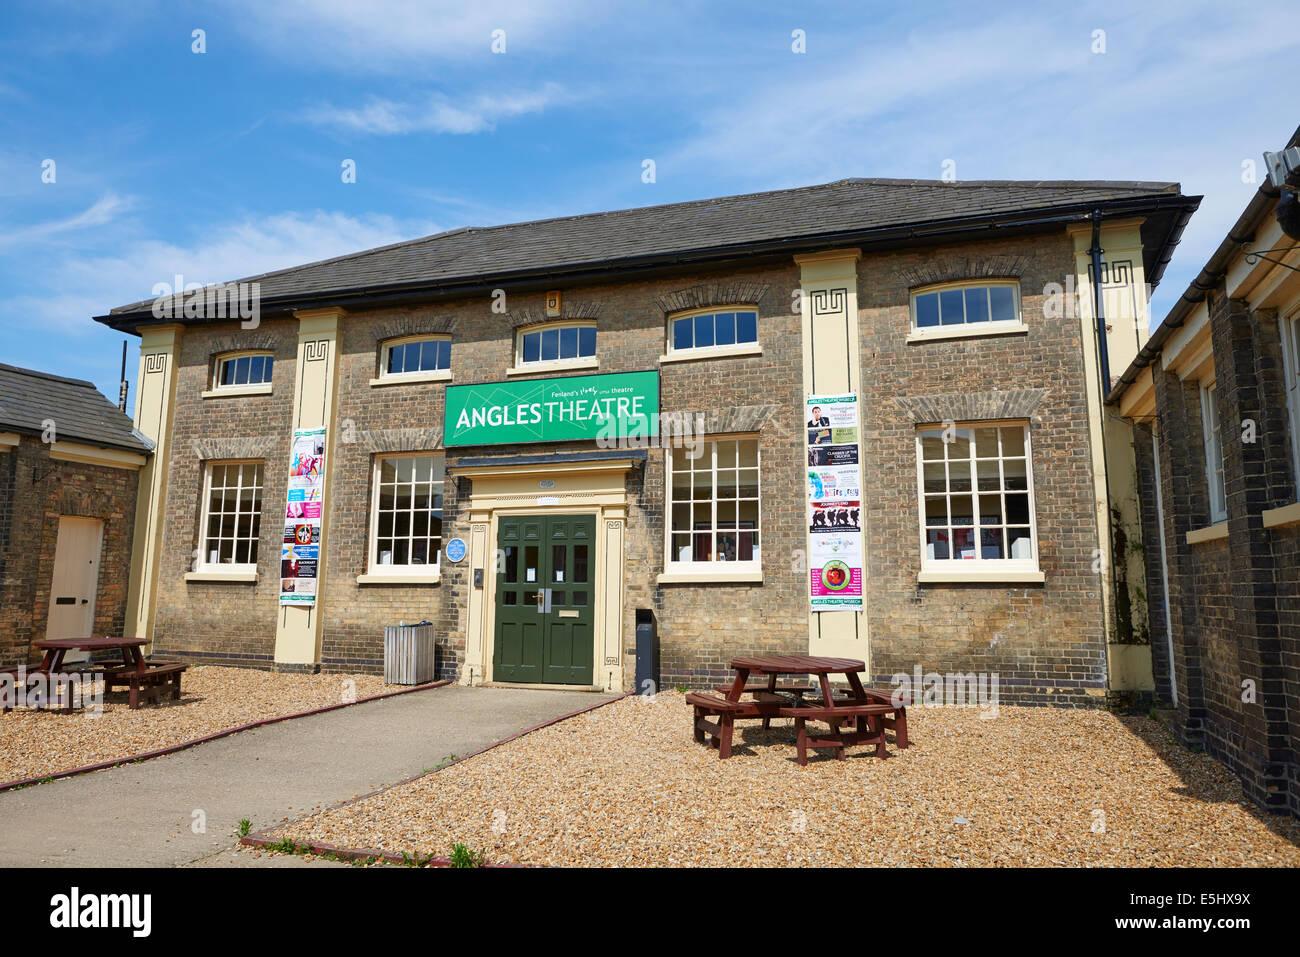 Angles Theatre Alexandra Road Wisbech Fenland Cambridgeshire UK - Stock Image